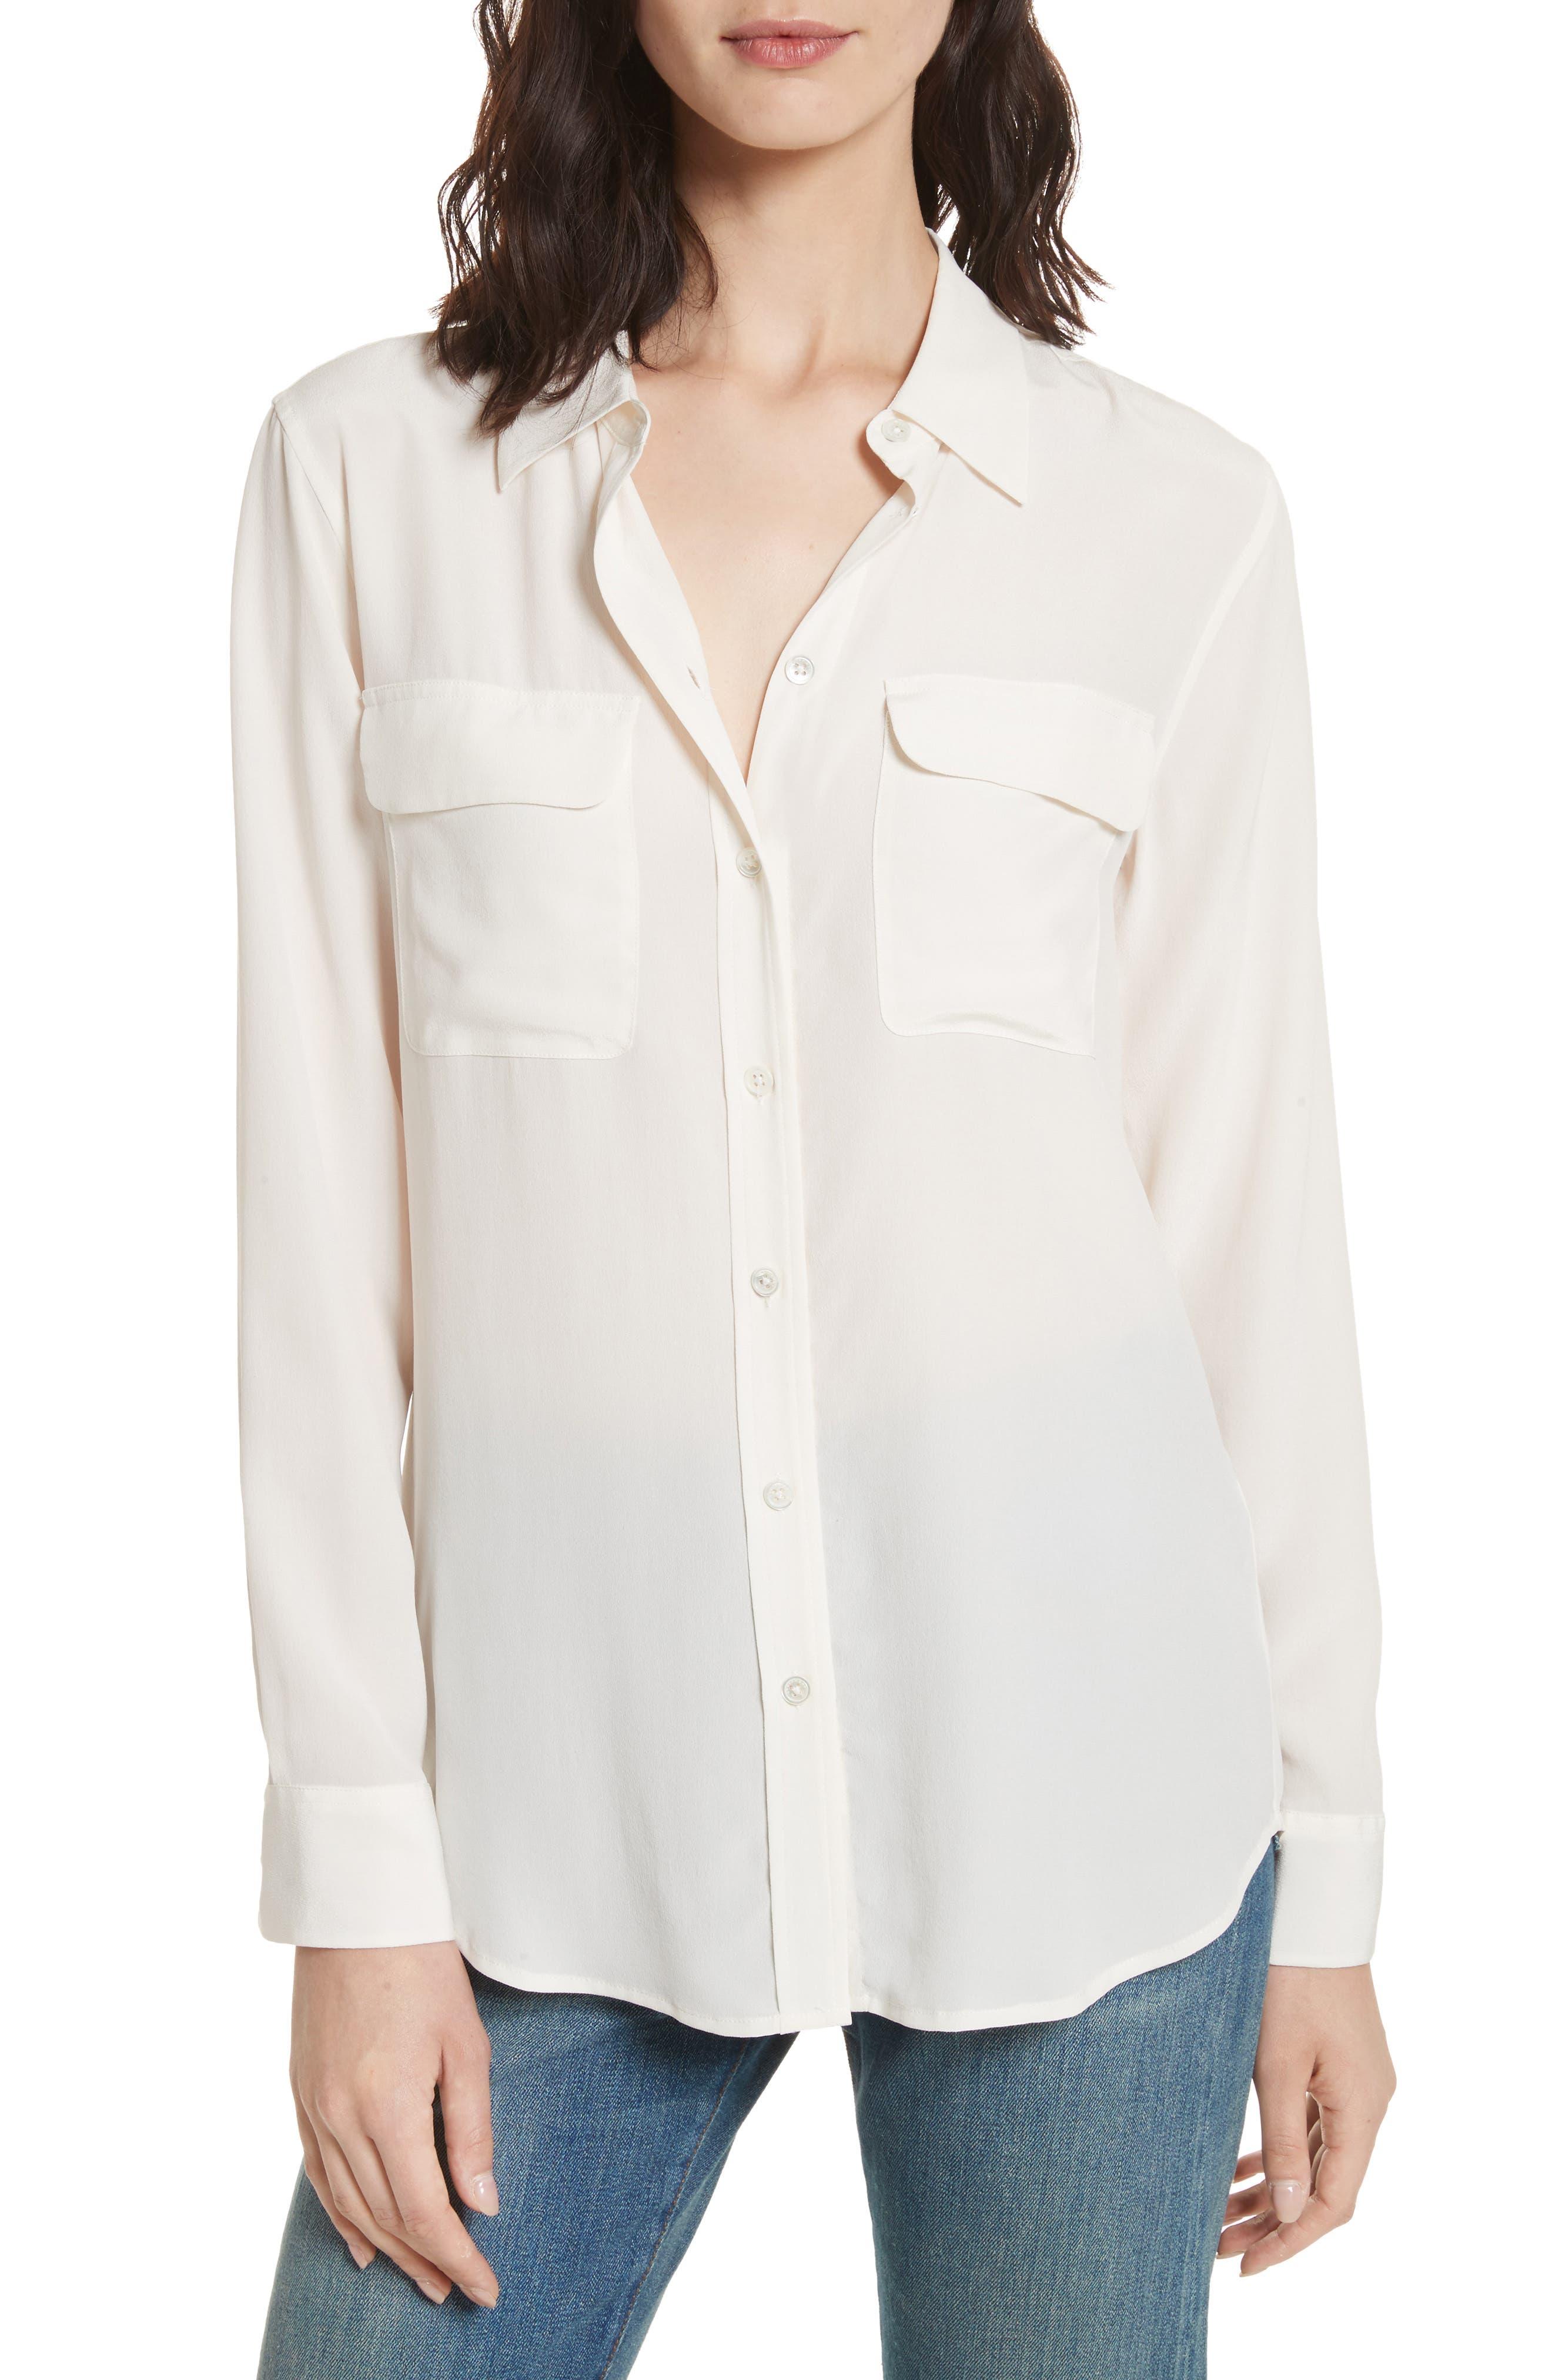 EQUIPMENT,                             'Slim Signature' Silk Shirt,                             Main thumbnail 1, color,                             BRIGHT WHITE